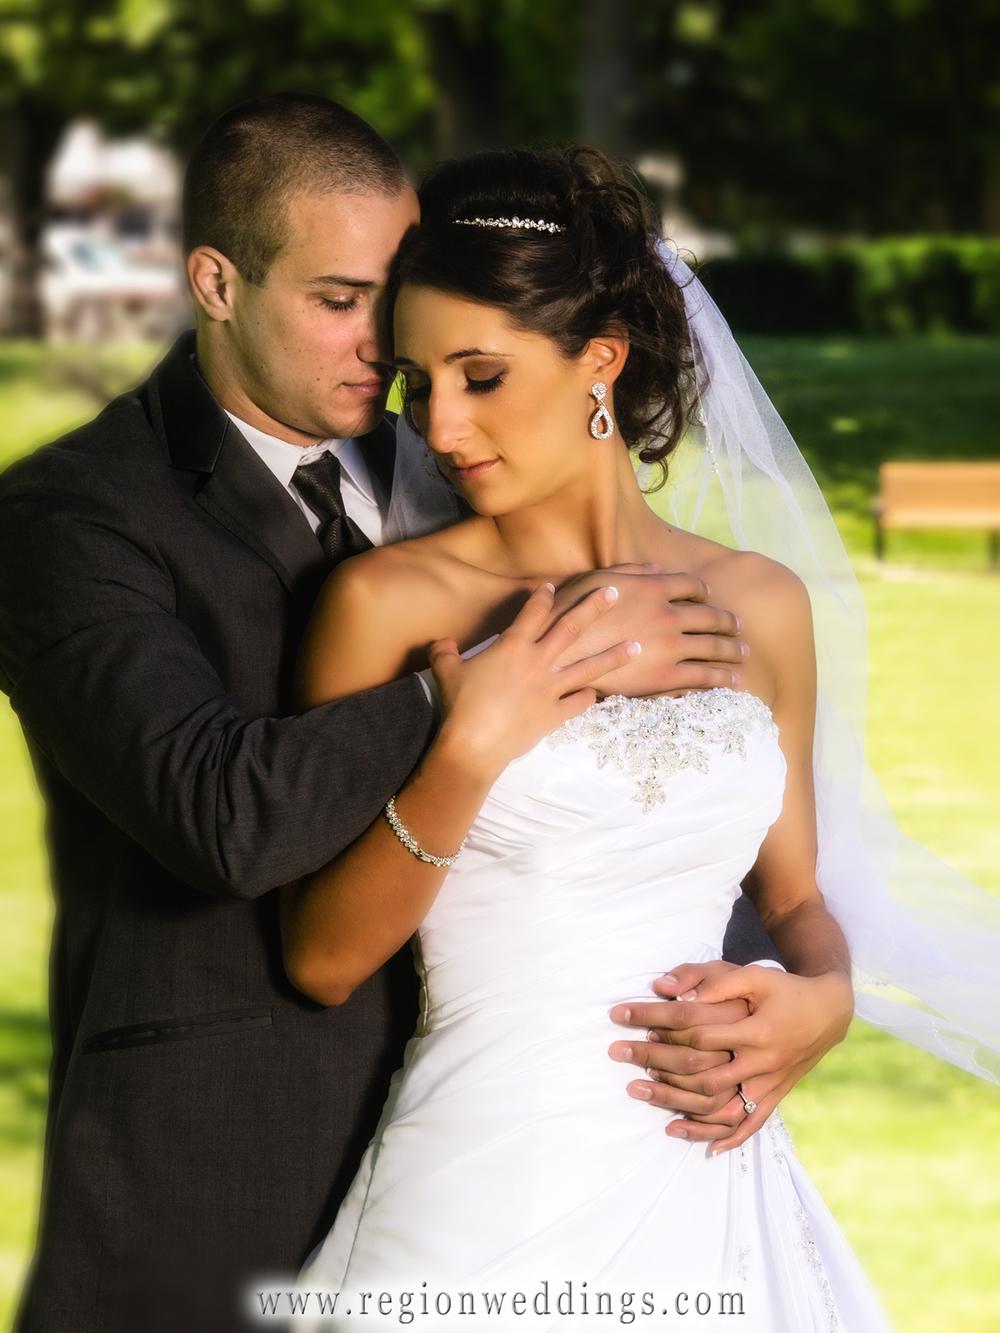 Northwest Indiana Wedding Photographer Year In Review 2013 Pt1 Region Weddings